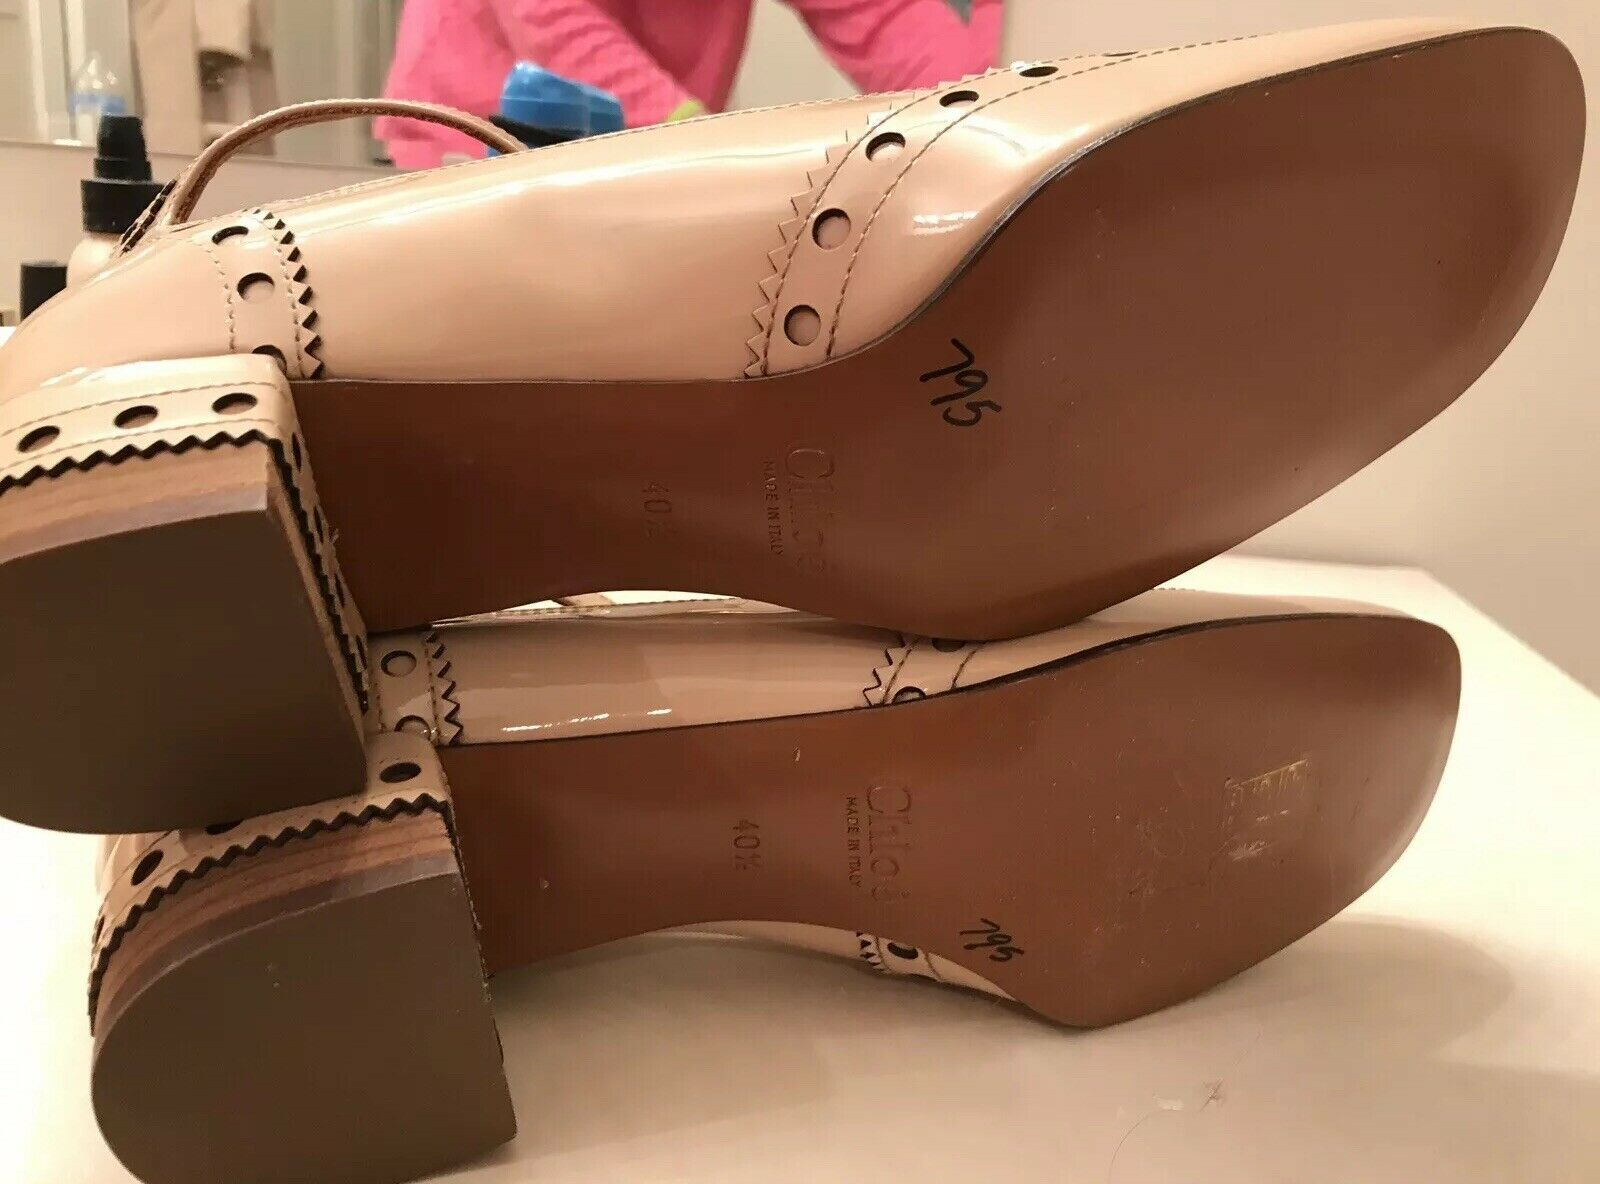 Chloe Perry Beige Beige Beige 10.5 40.5 patente Brogue punta del ala Zapato de correa T Nuevo  795 61eb4c